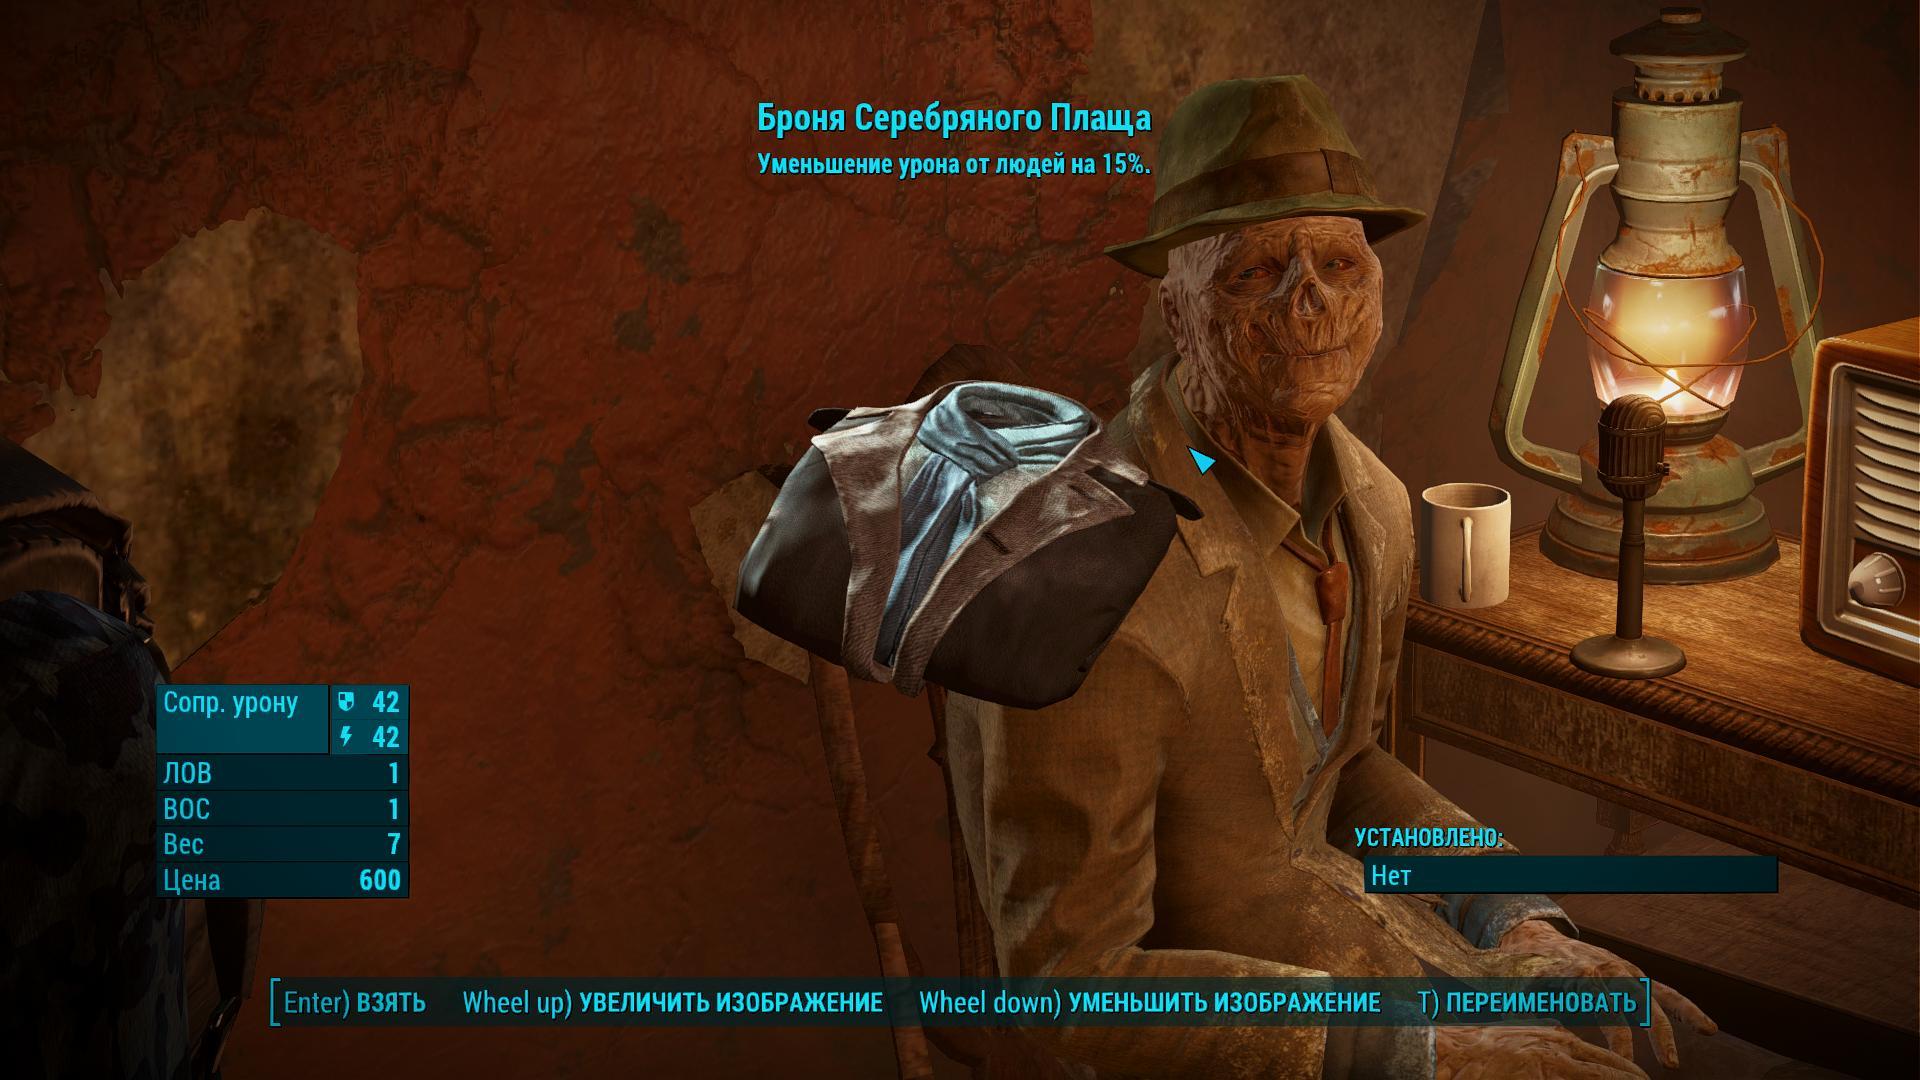 000522.Jpg - Fallout 4